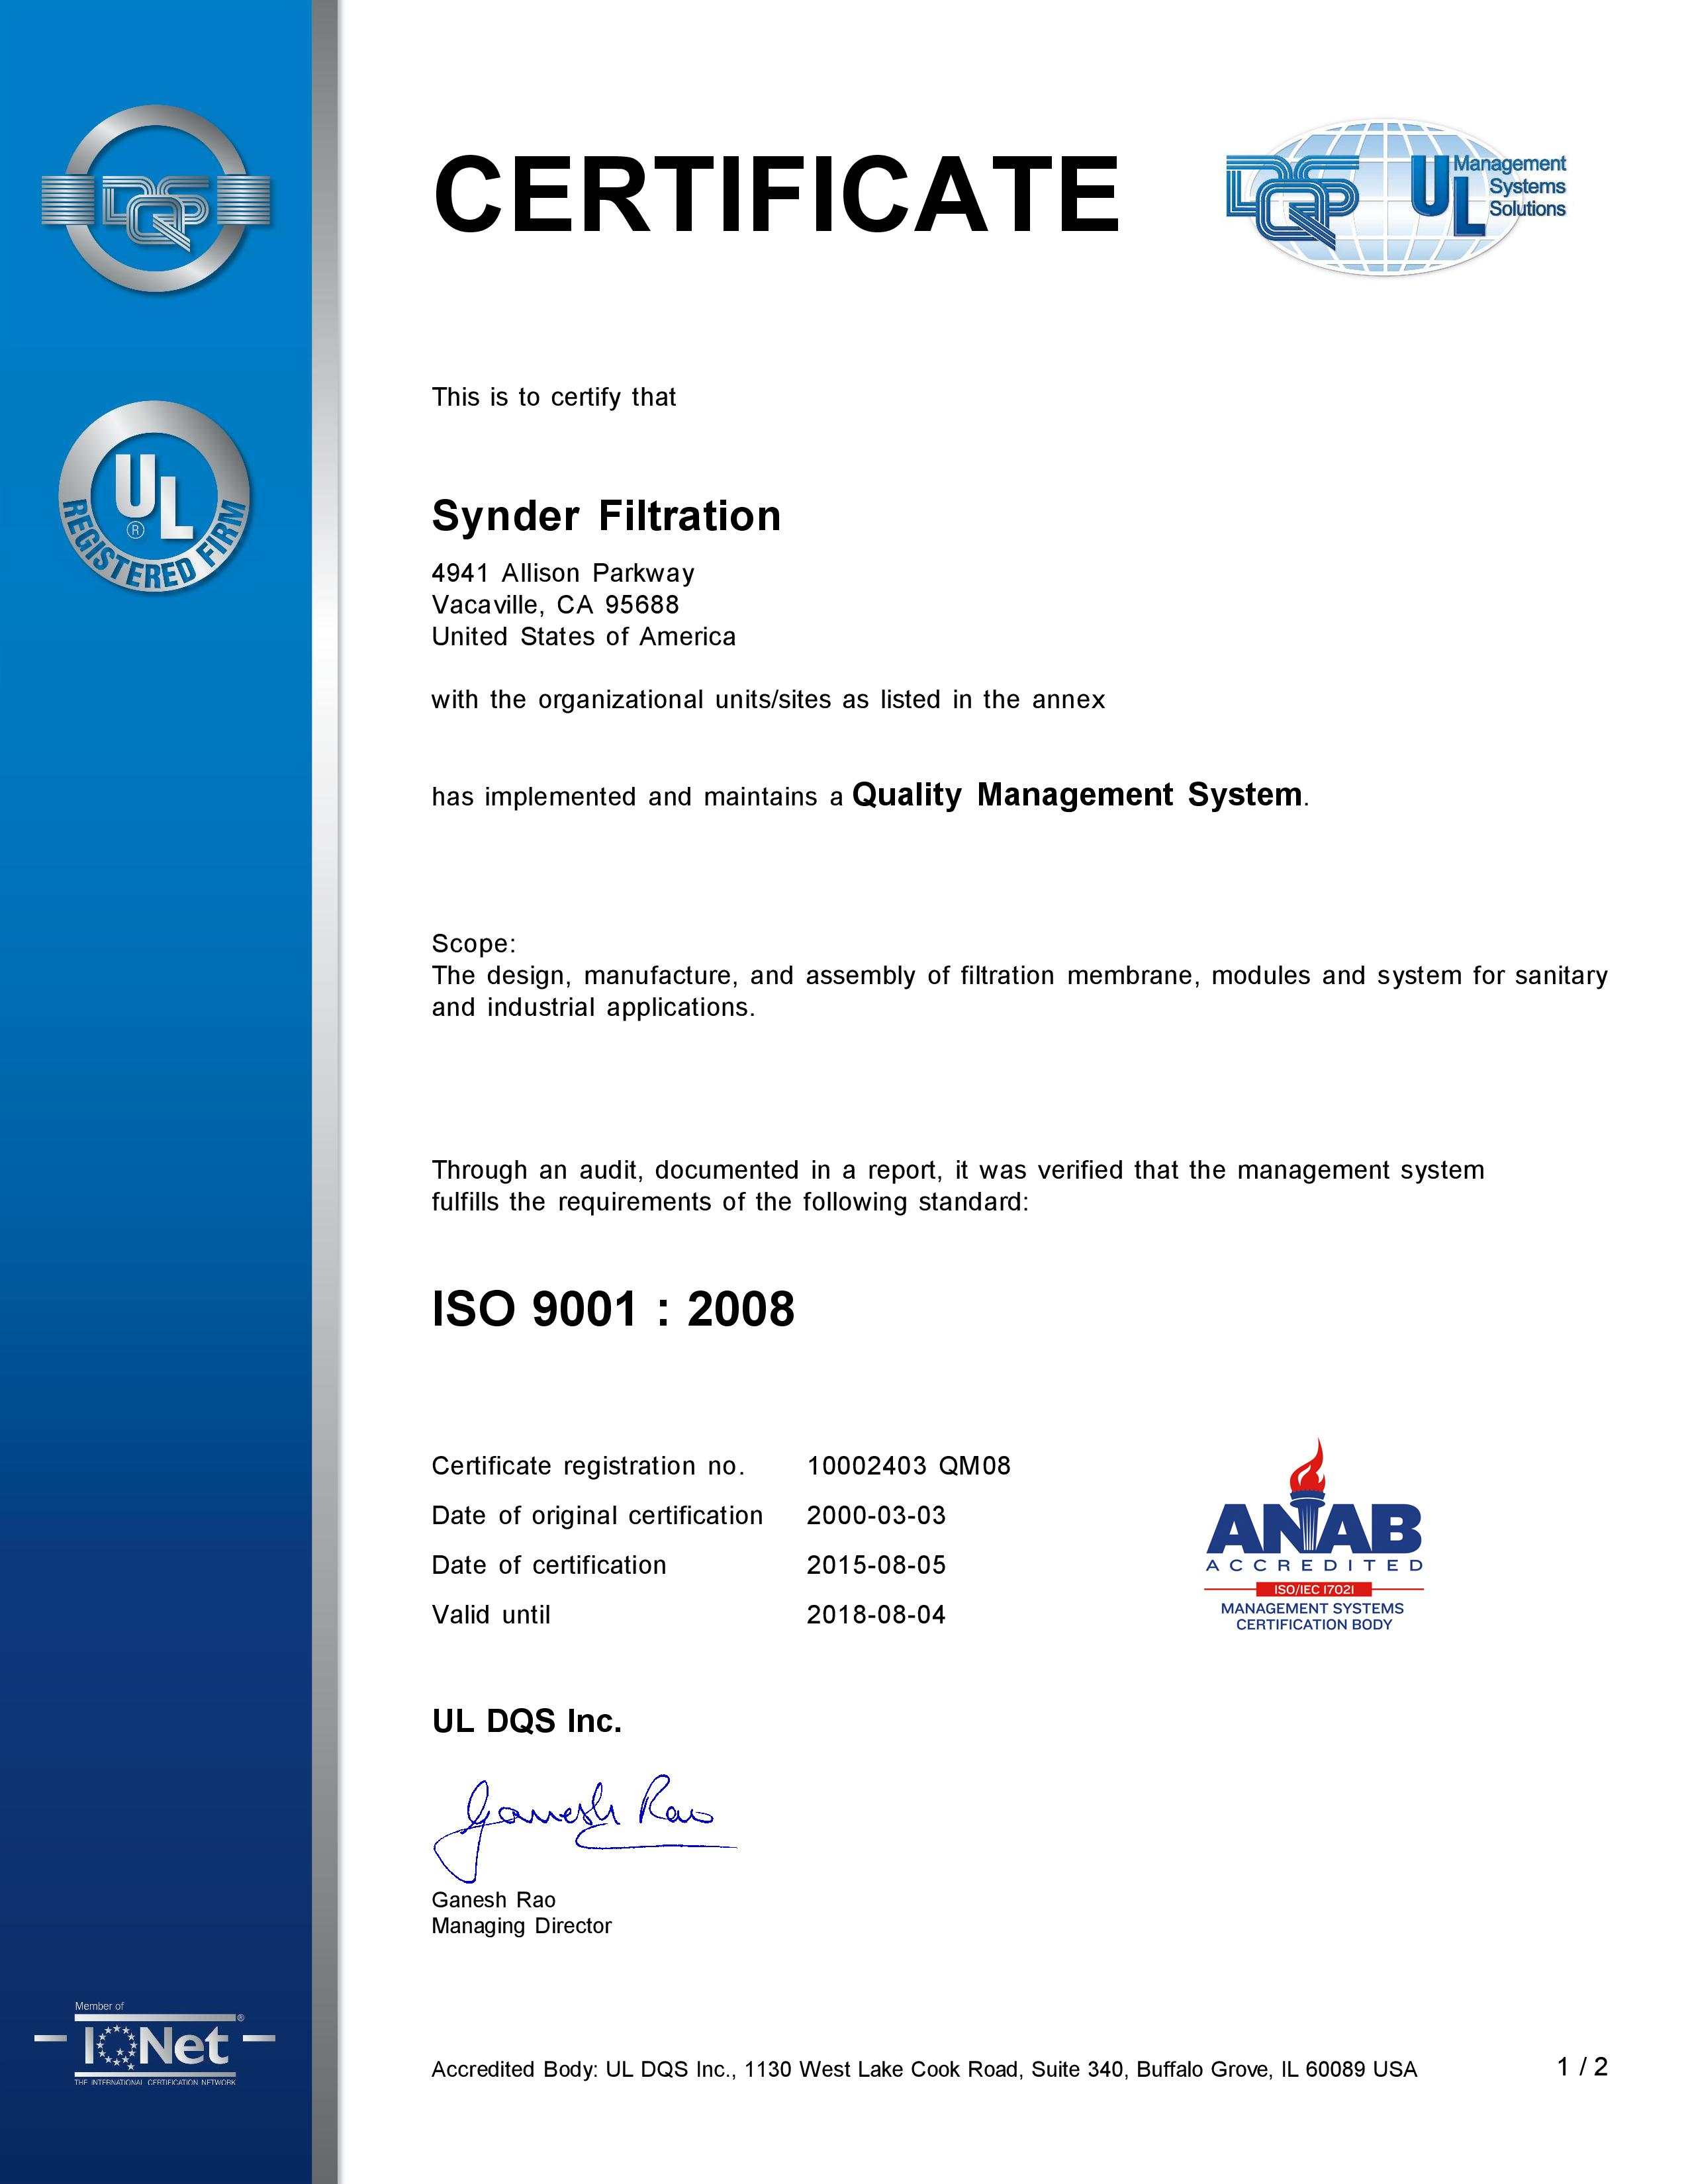 QM08_10002403 QM08_EN-page-001